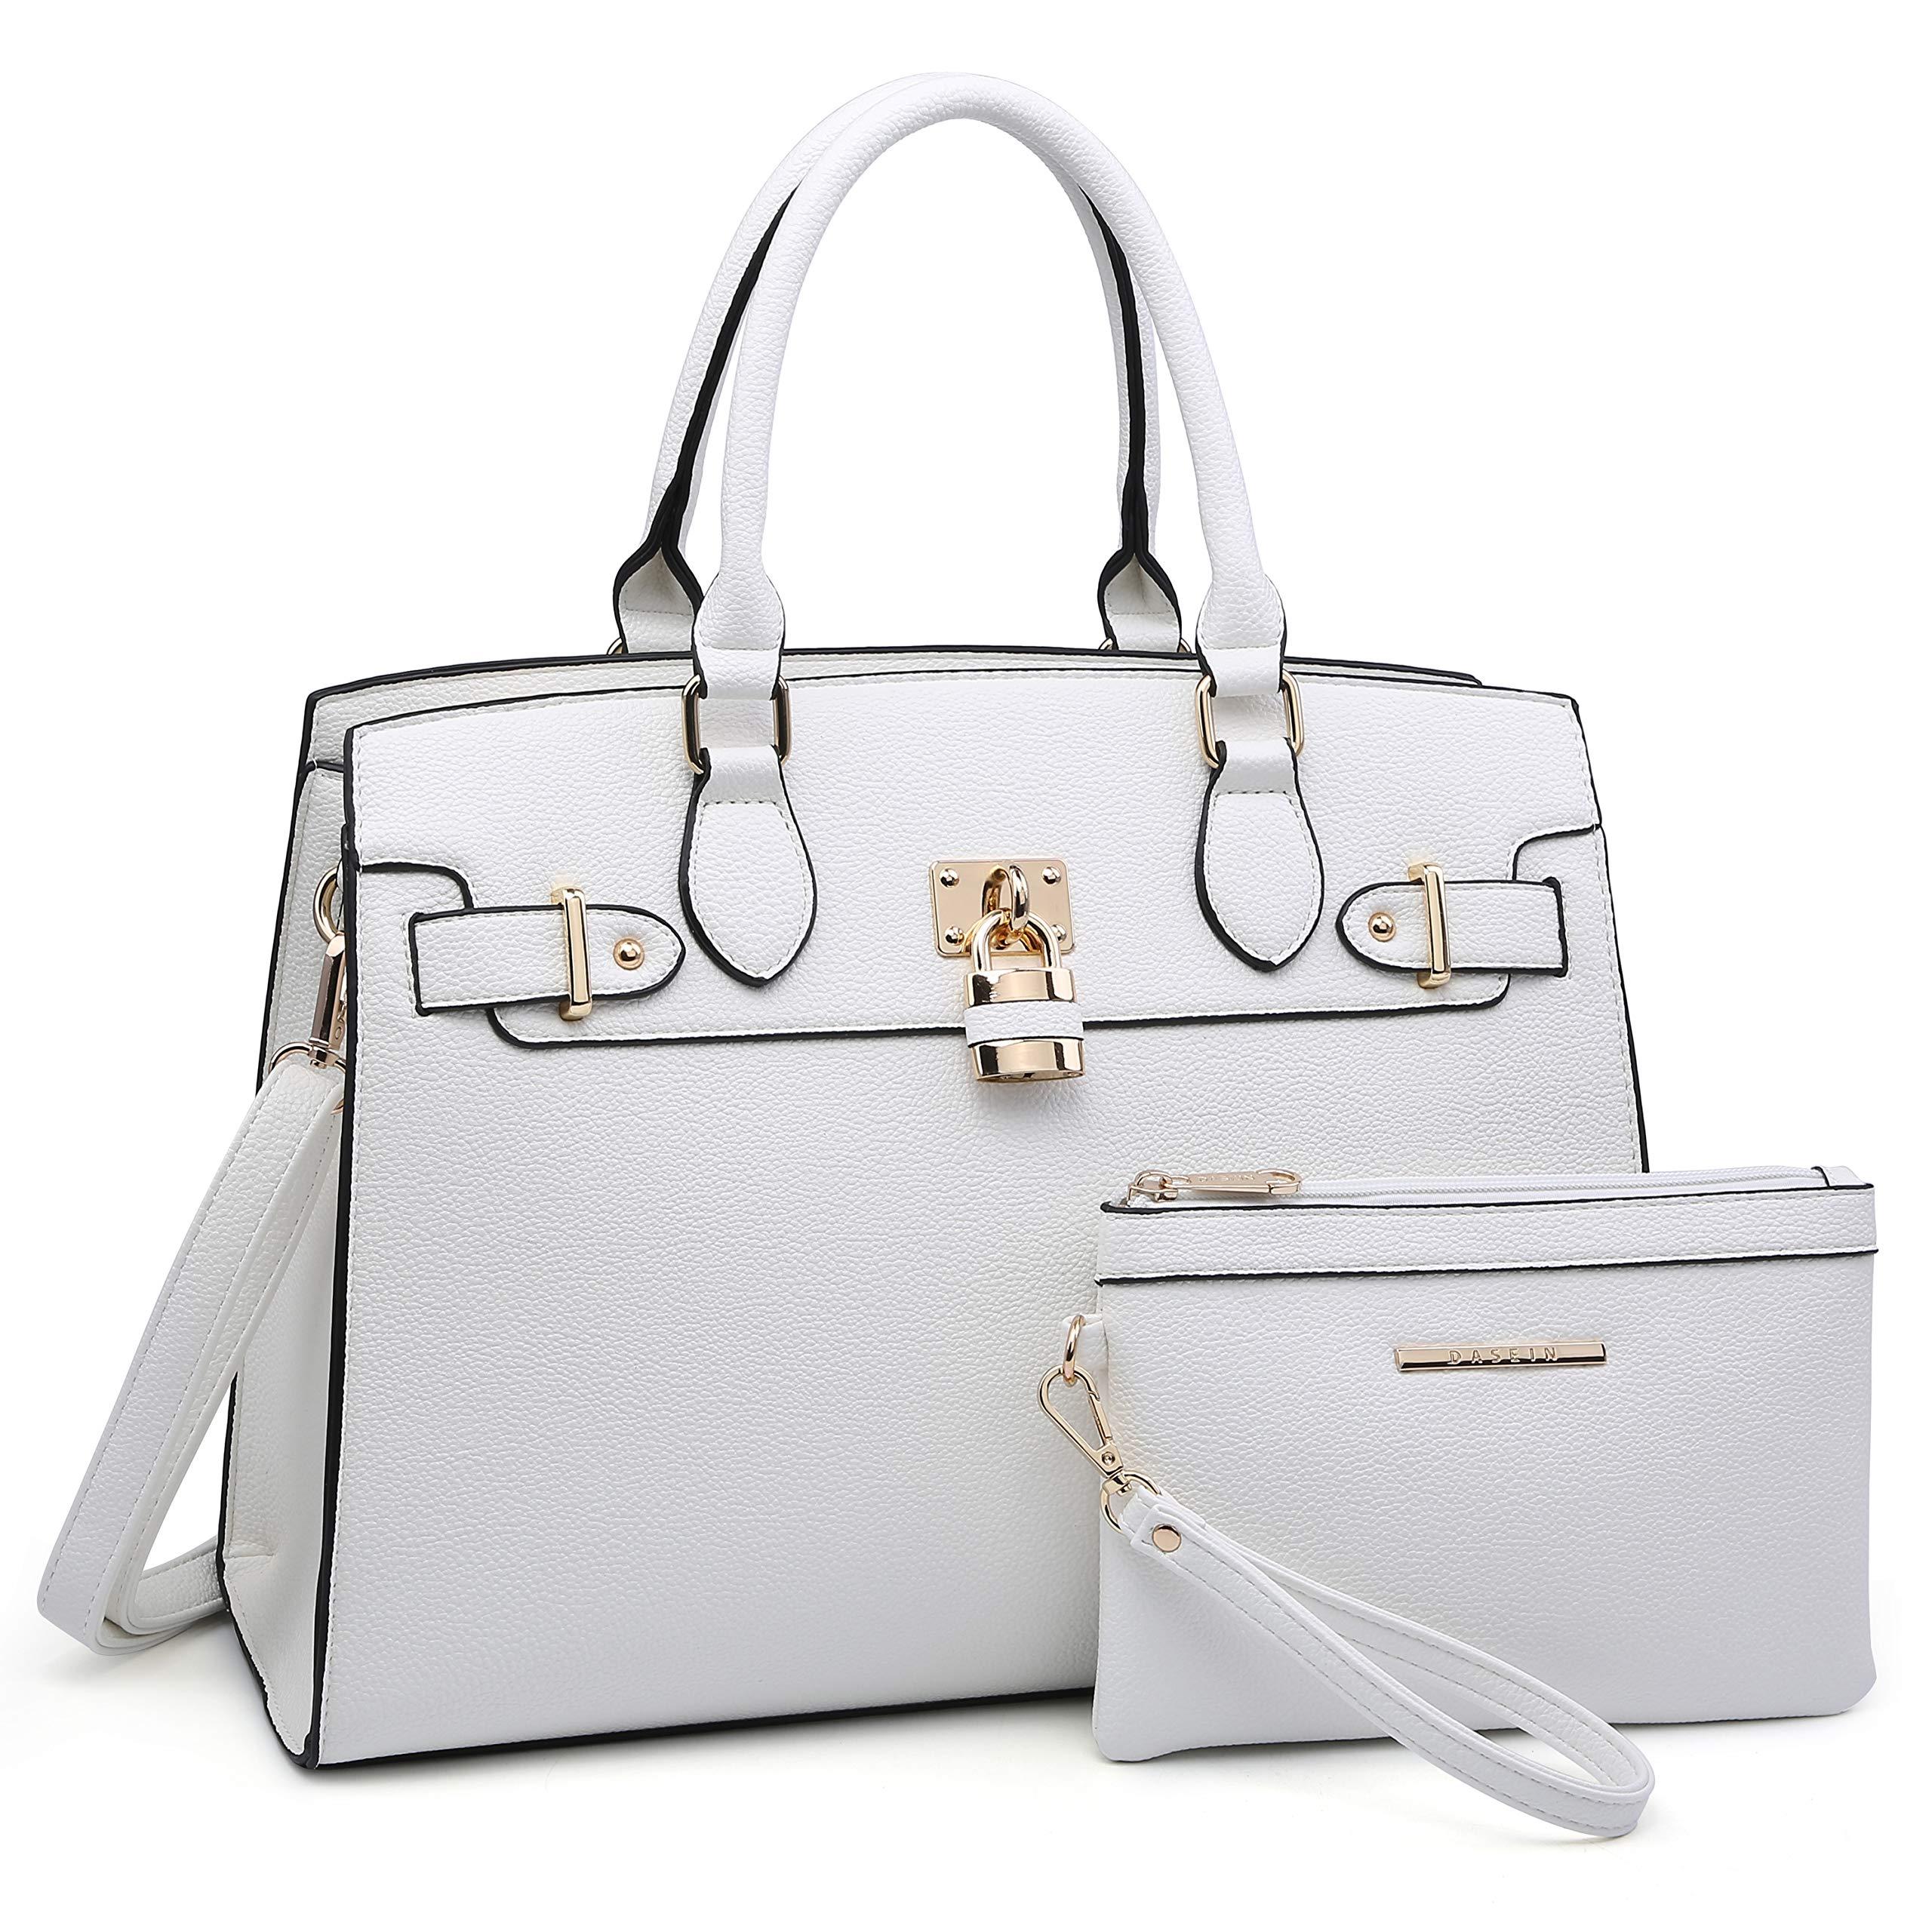 Women Handbags and Purses Ladies Shoulder Bag Ostrich Top Handle Satchel Tote Work Bag with Wallet (23- White)